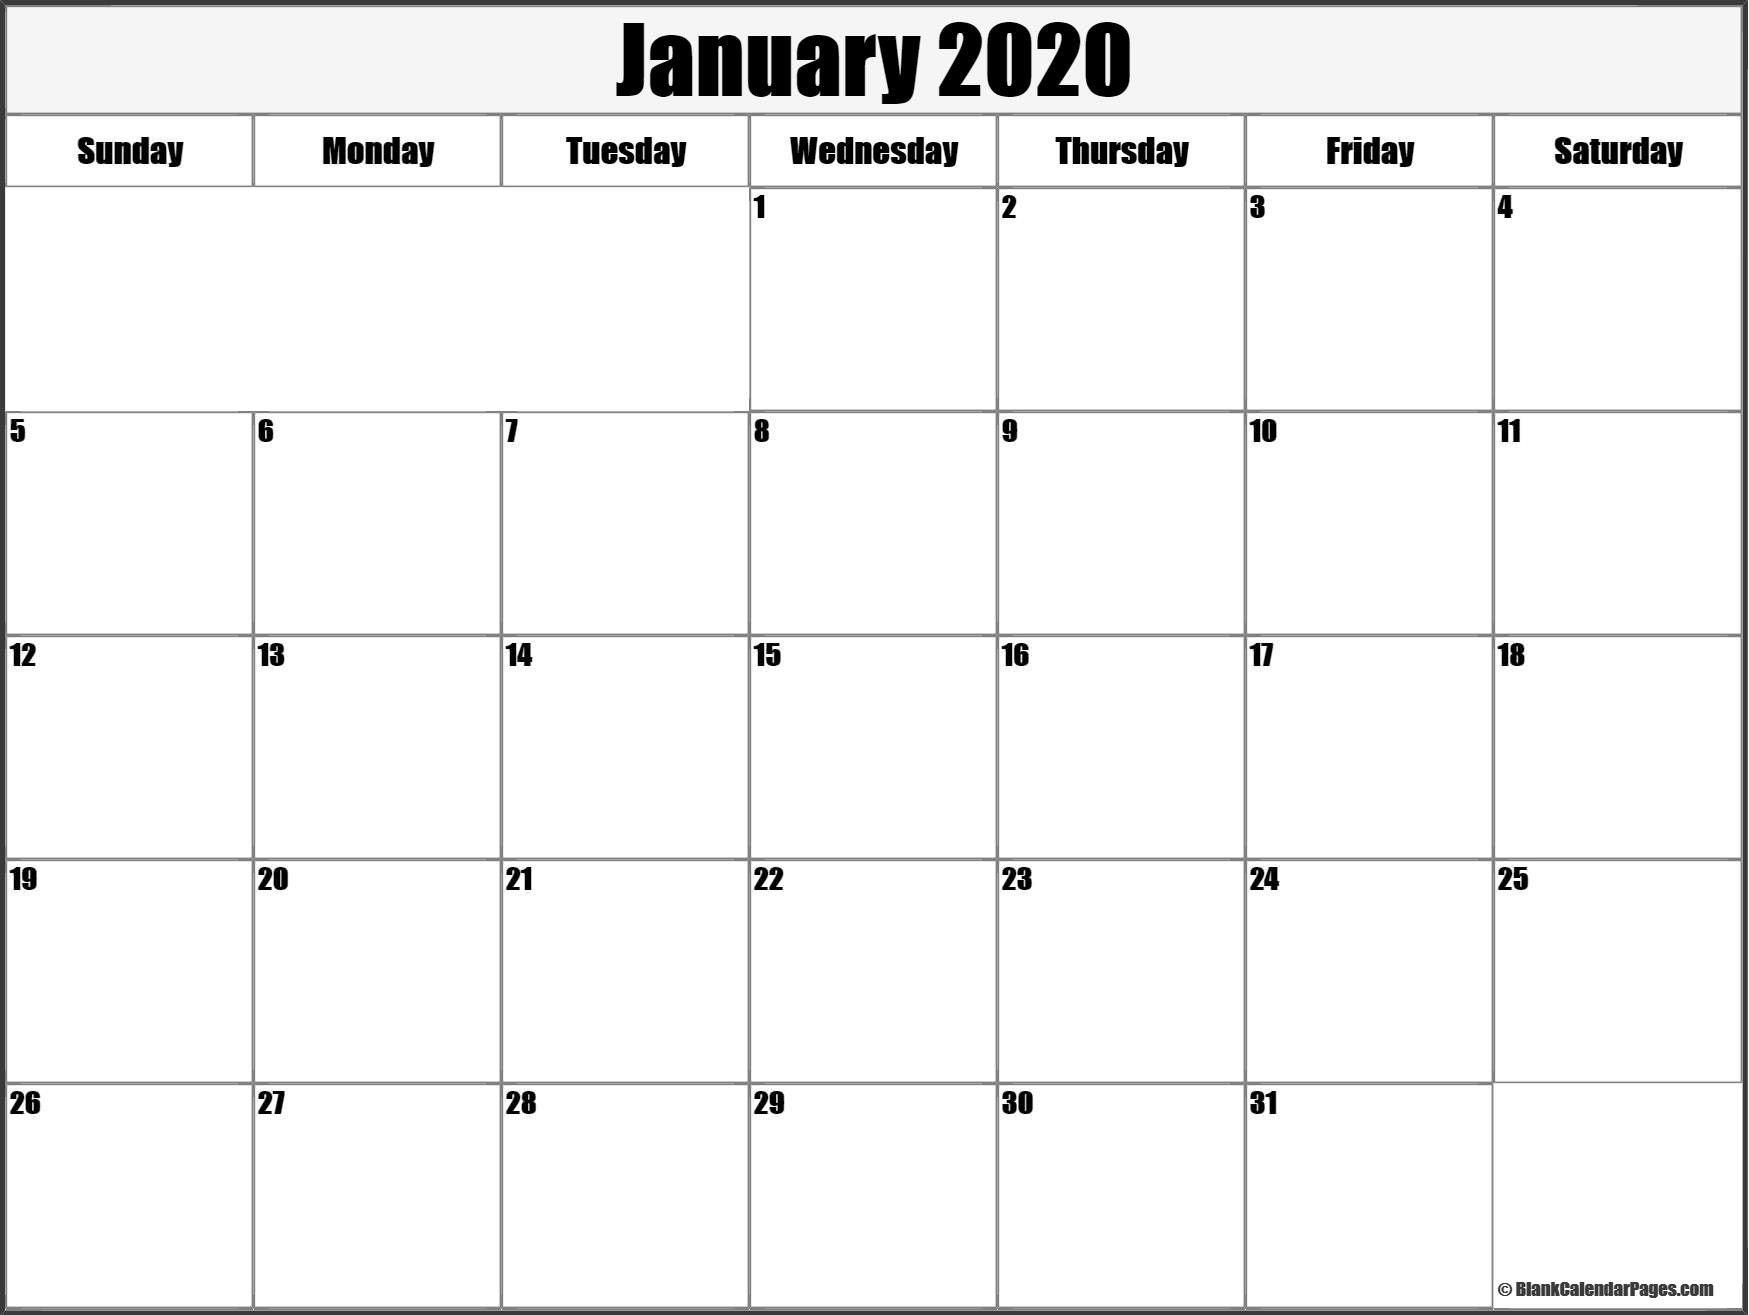 January 2020 Calendar Template.January 2020 Calendar Template January January2020